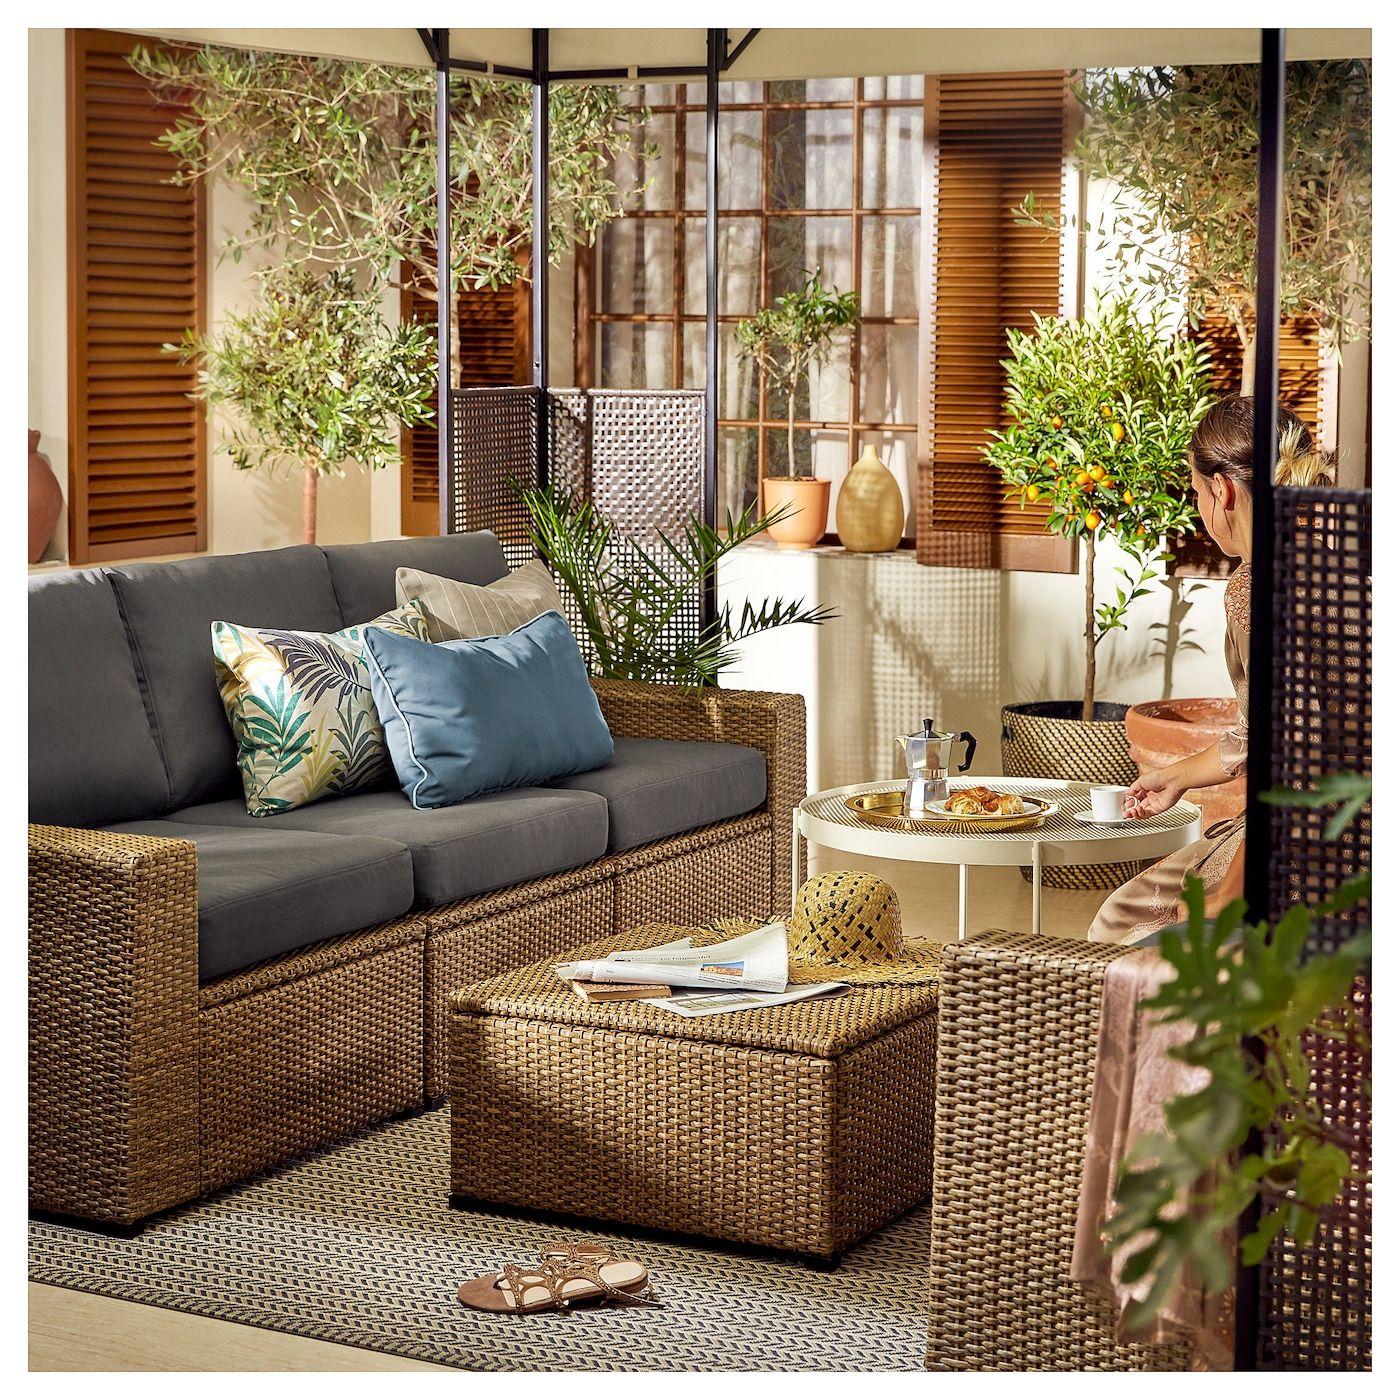 Solleron 3 Seat Modular Sofa Outdoor Brown Froson Duvholmen Dark Gray Ikea In 2020 Ikea Outdoor Gartenmobel Sets Rattan Gartenmobel